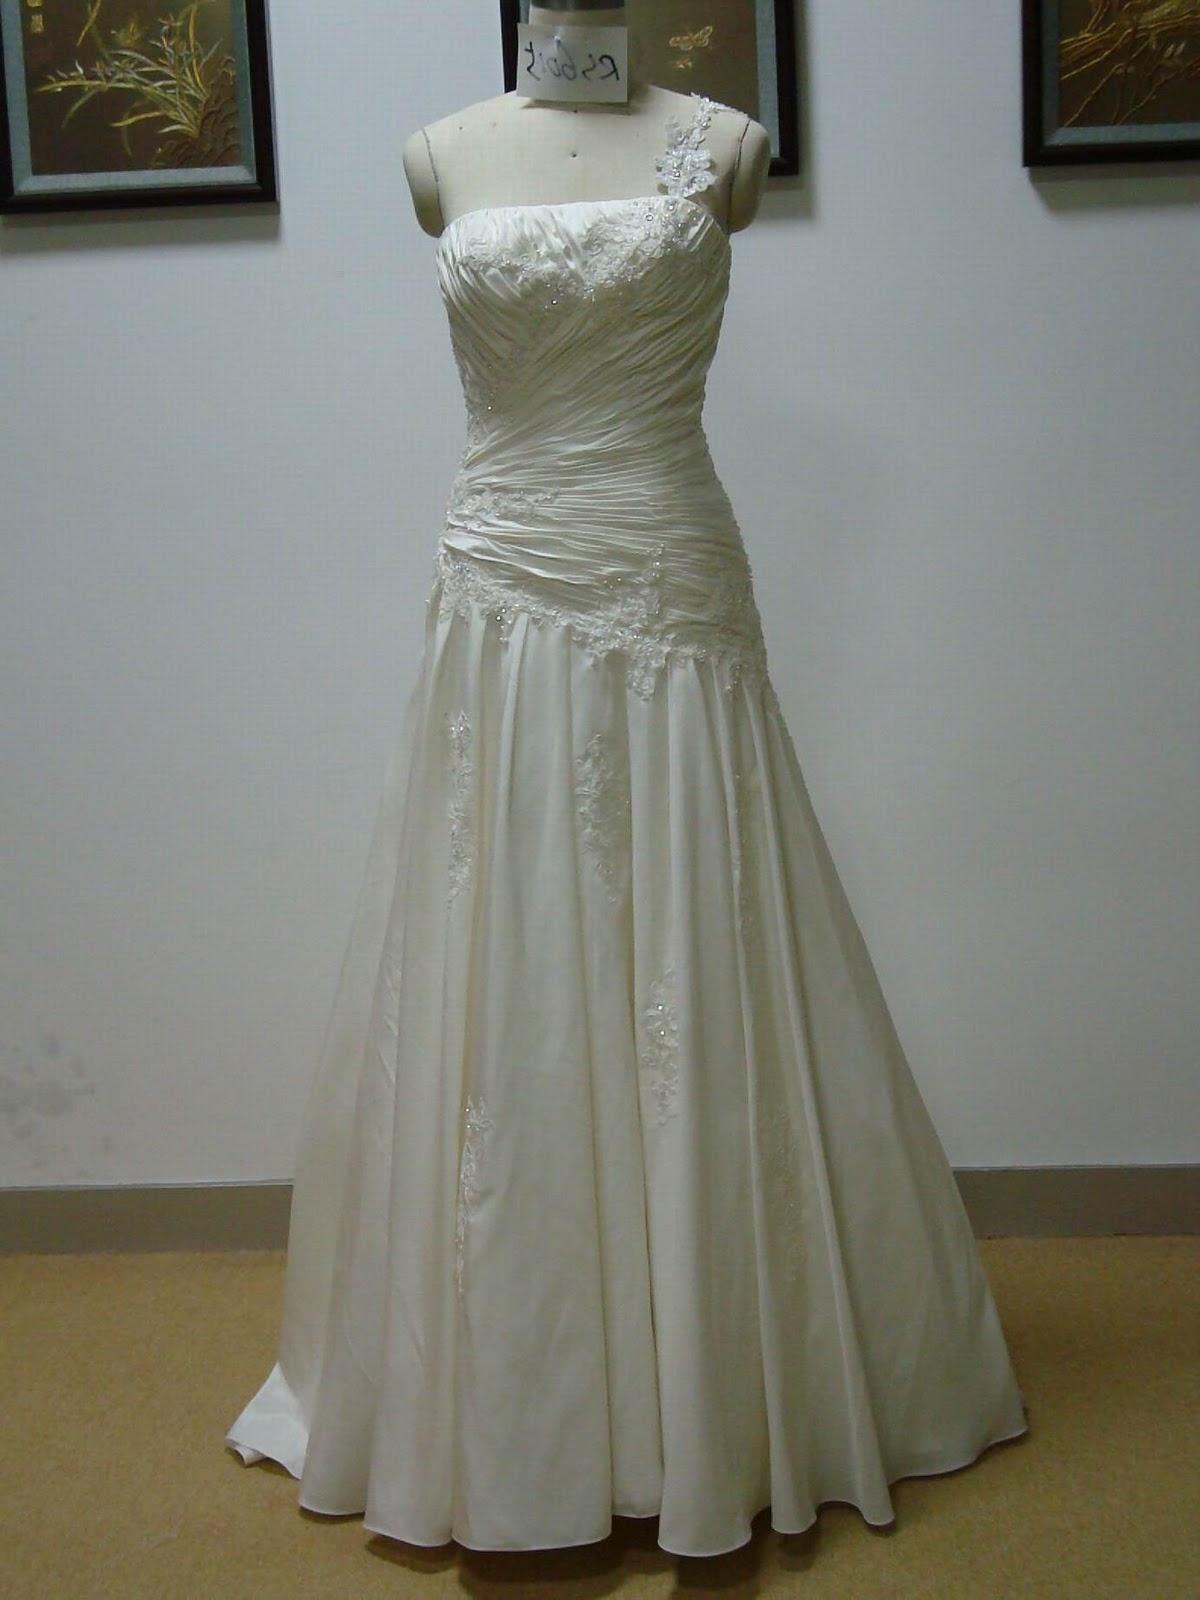 Spanish wedding dresses cake ideas and designs for Spanish lace wedding dress